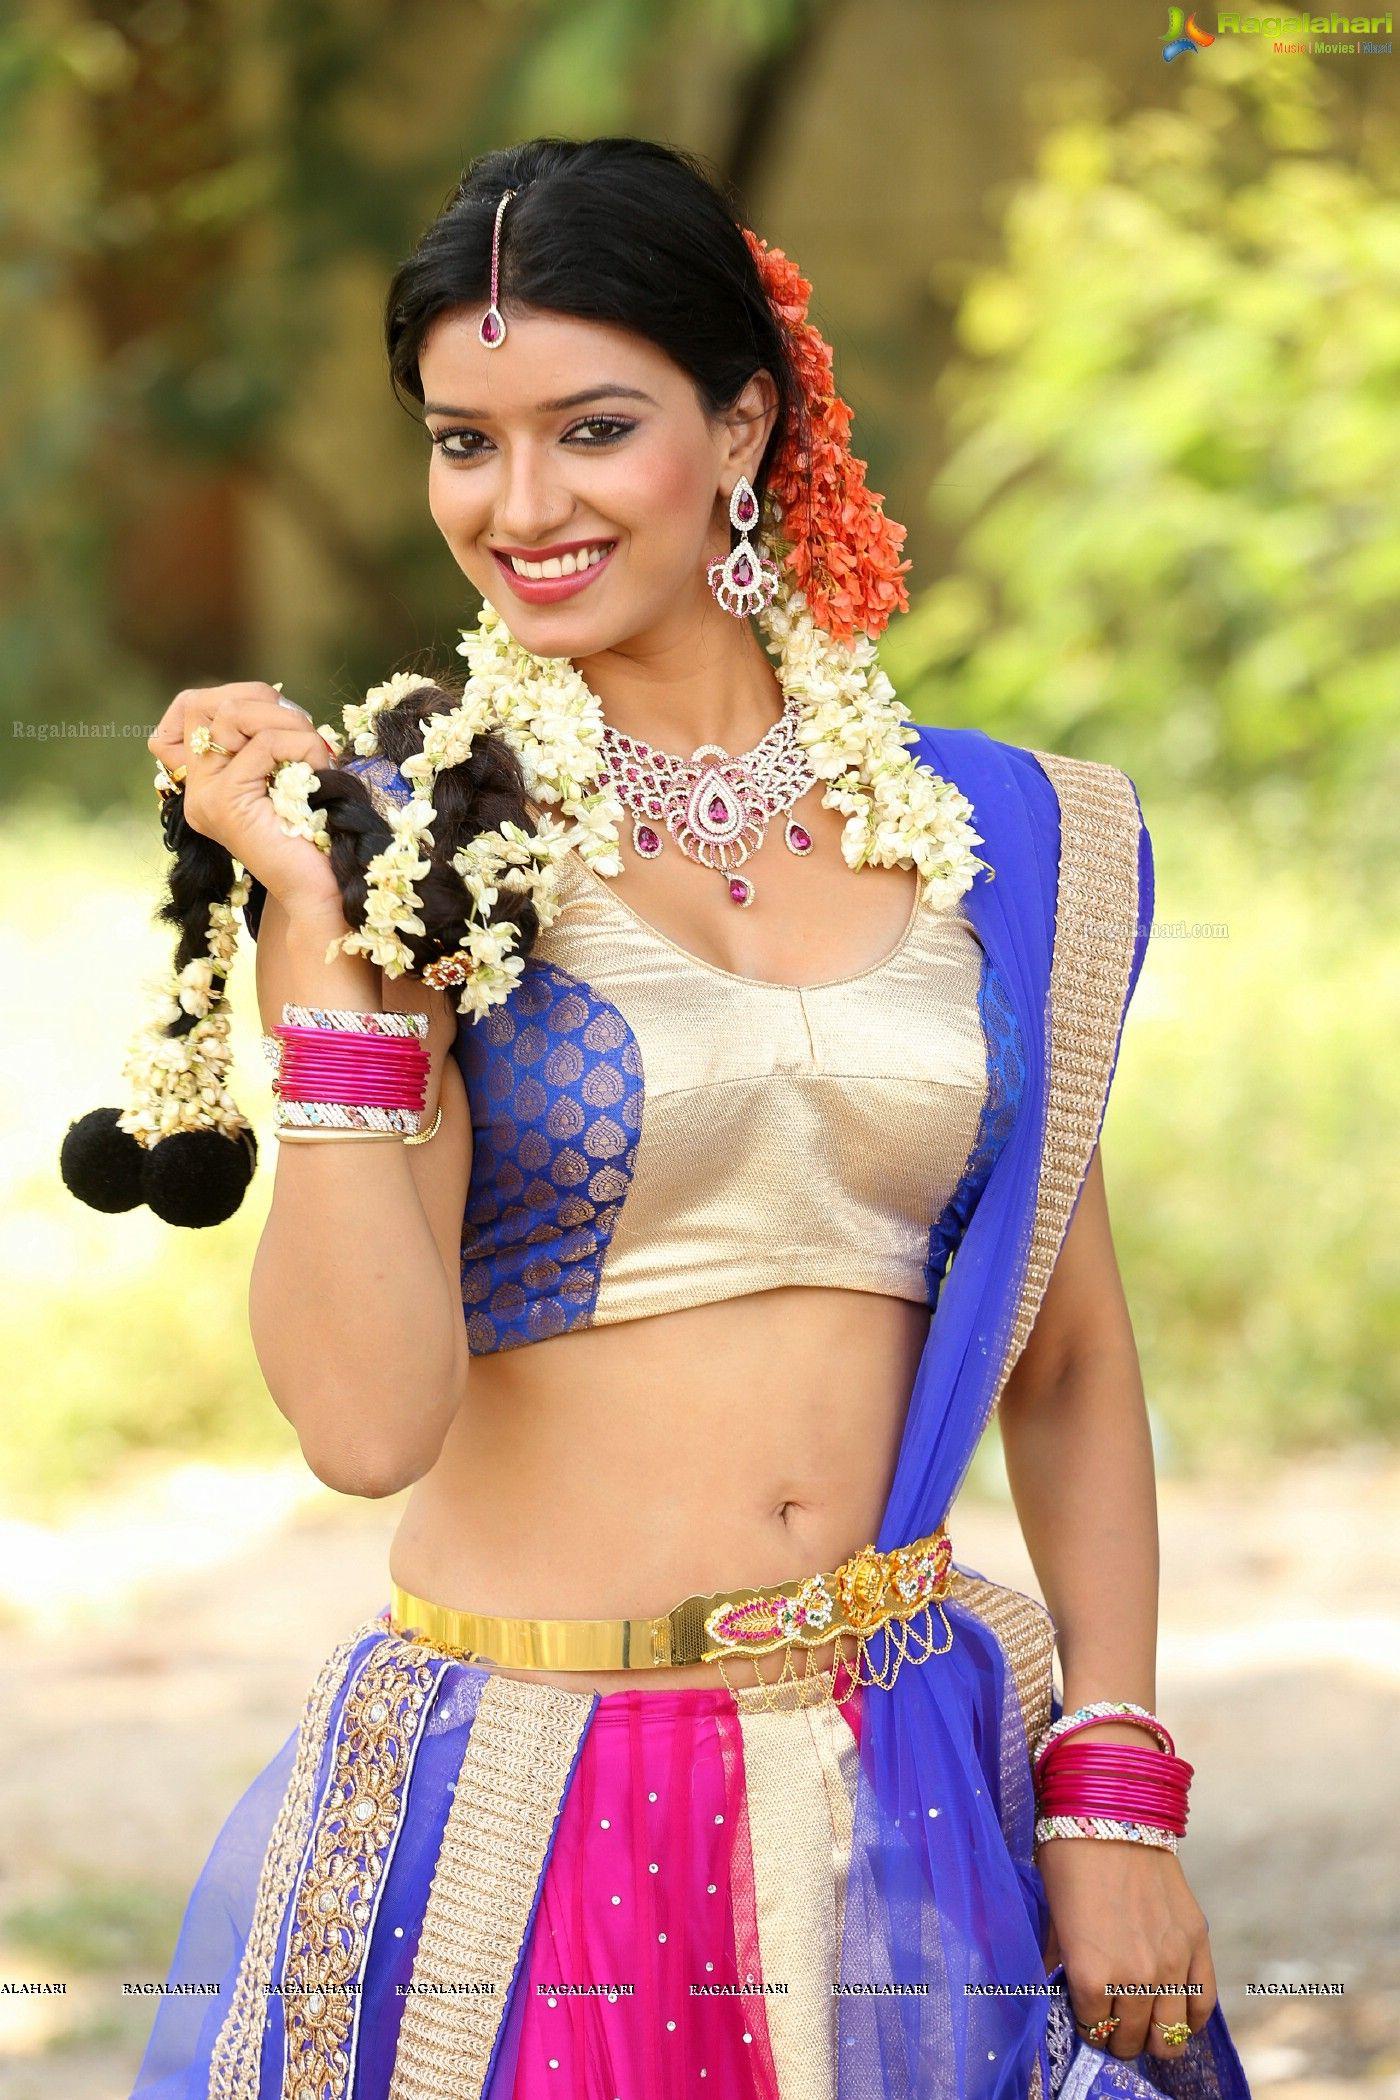 Jayamalini Jayamalini new pictures